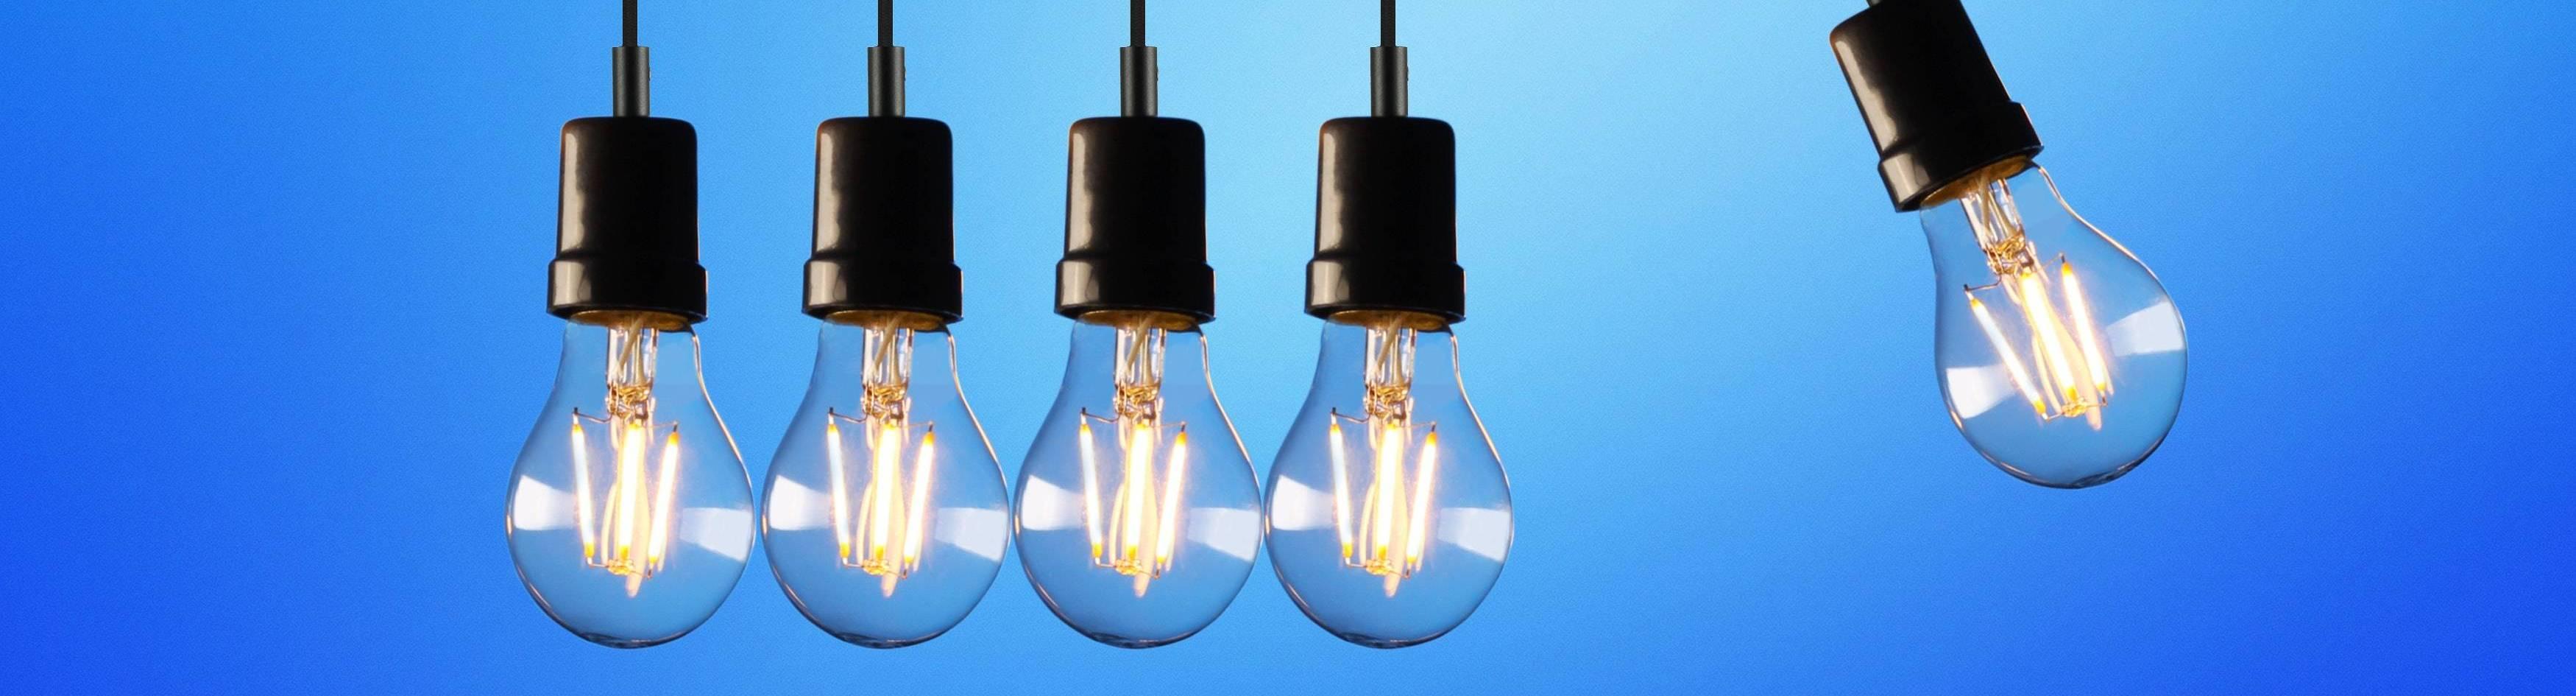 Seven novel renewable energy technologies